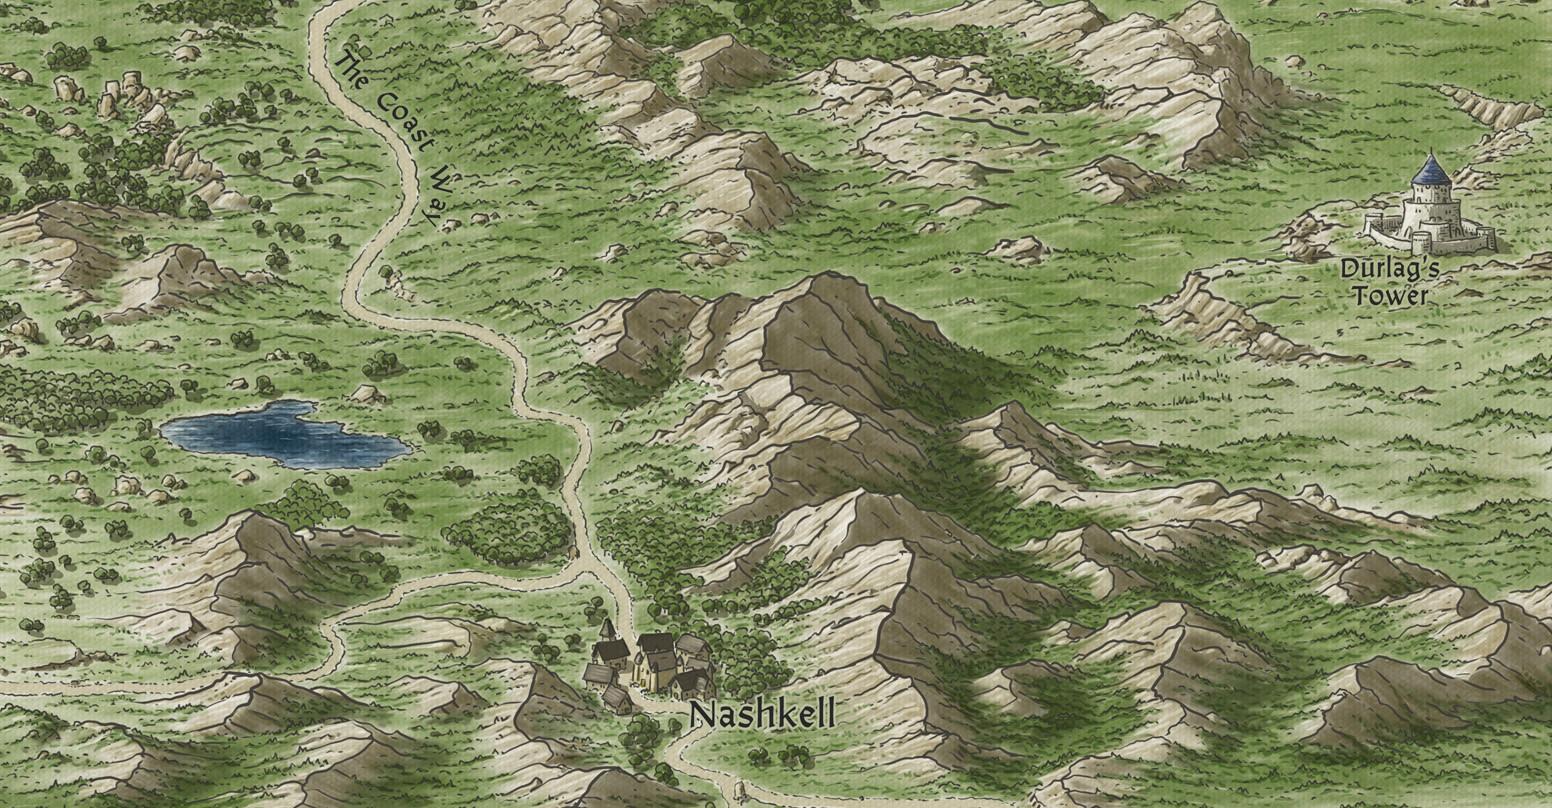 John Stevenson - Baldur's Gate - Sword Coast map